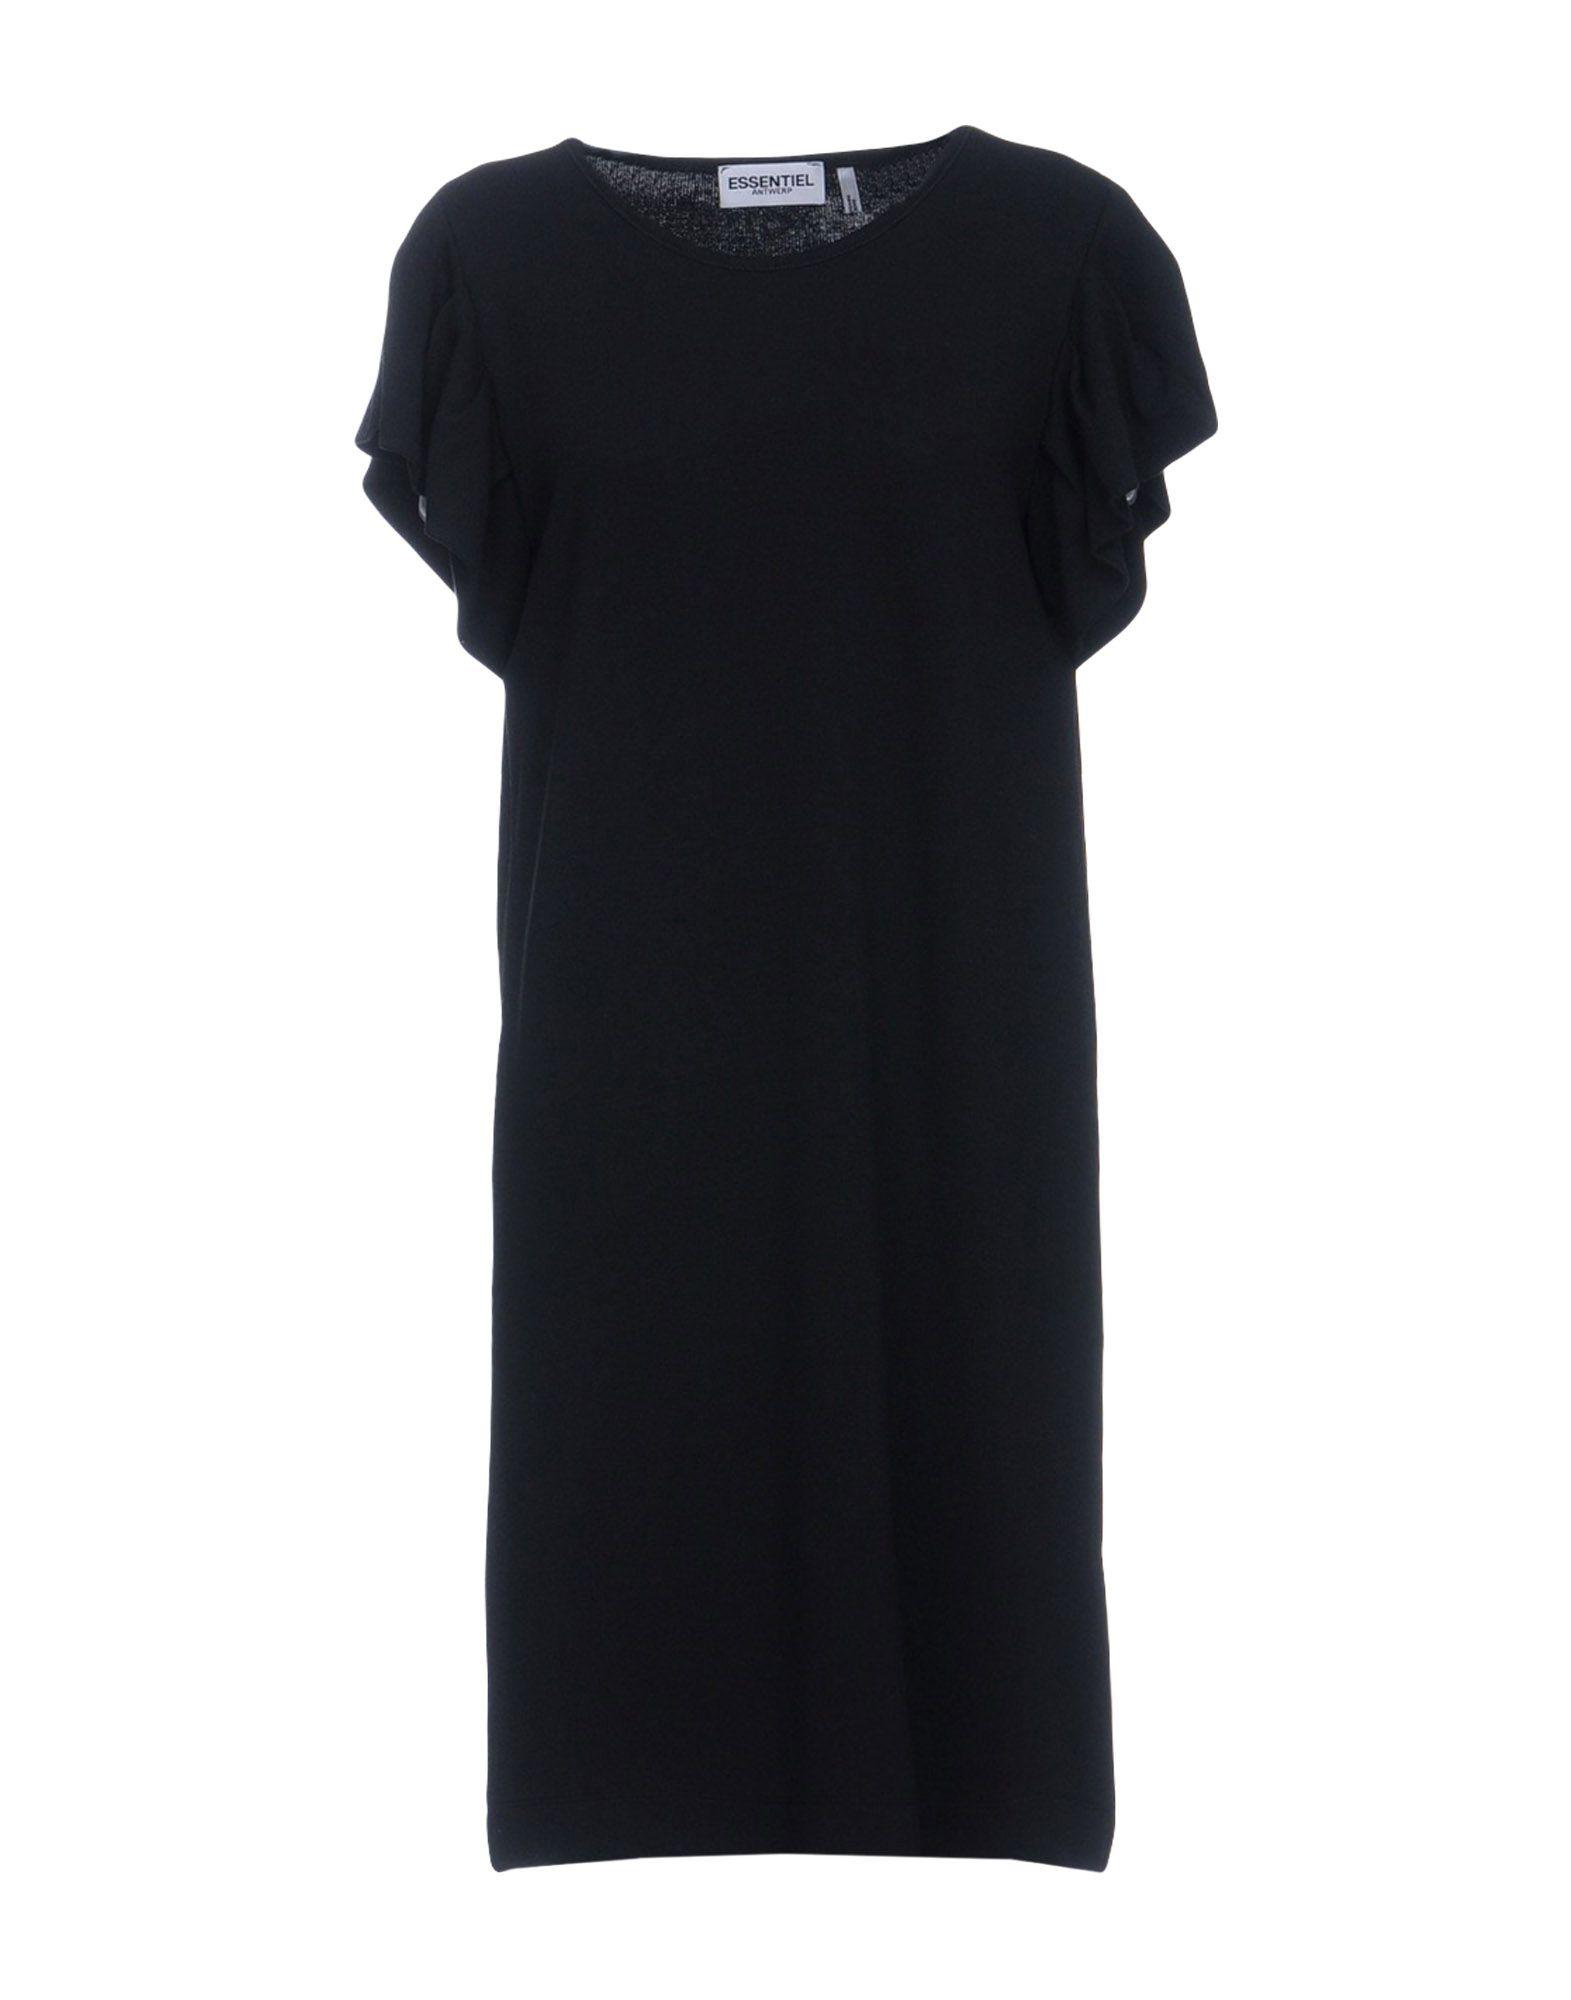 Vestito Corto Essentiel Antwerp Donna - Acquista online su 7qBZvo